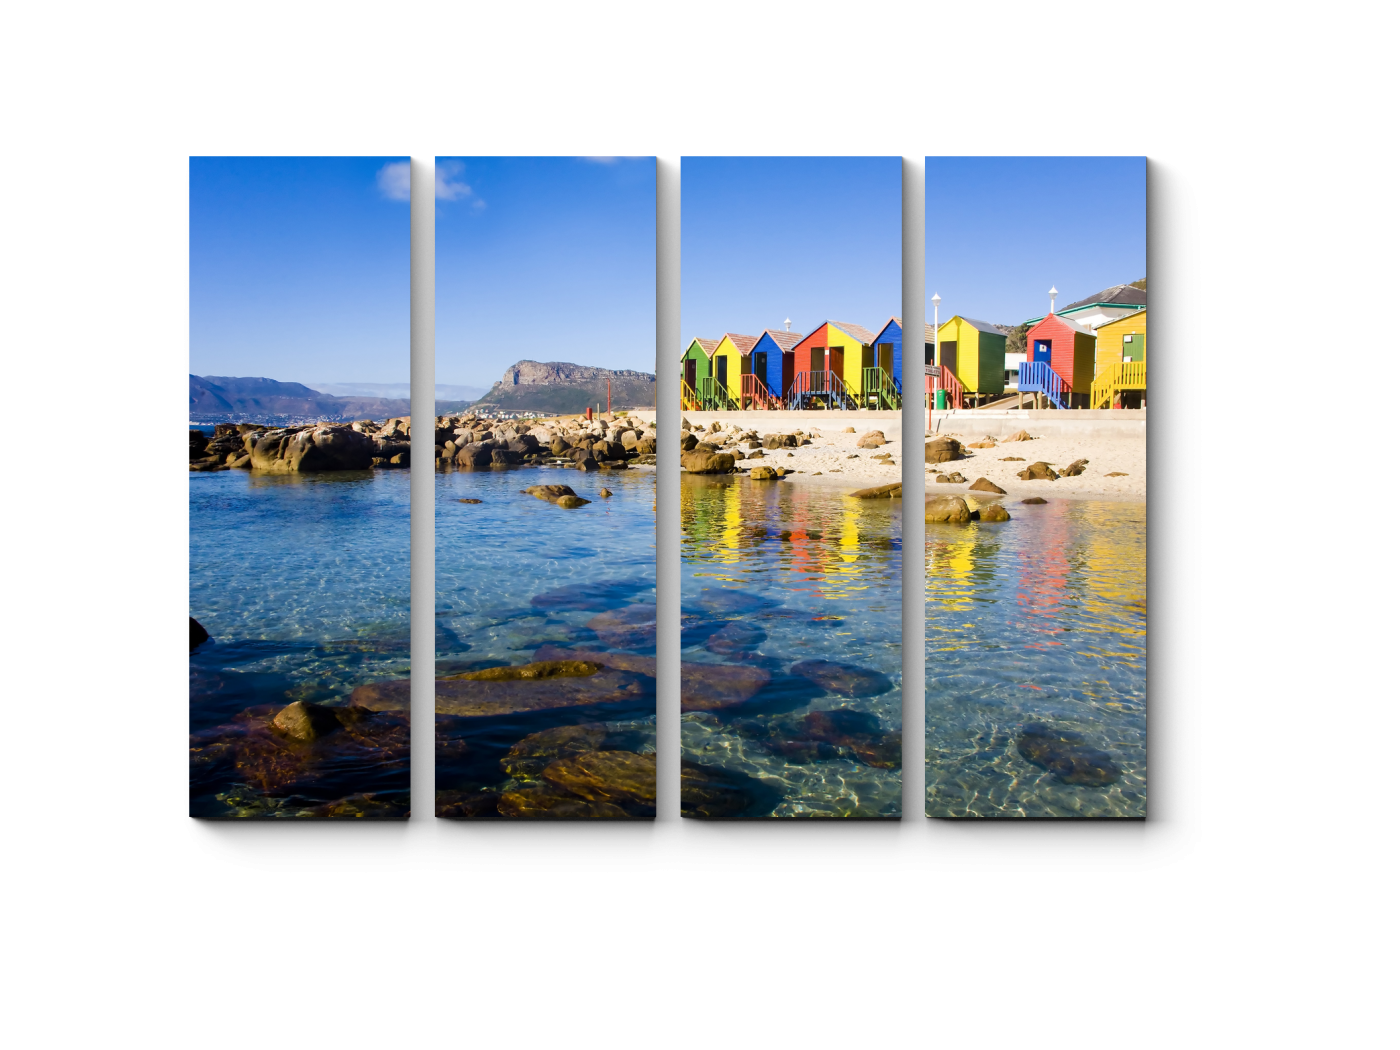 Модульная картина Пустынный пляж, Кейптаун (60x45) фото